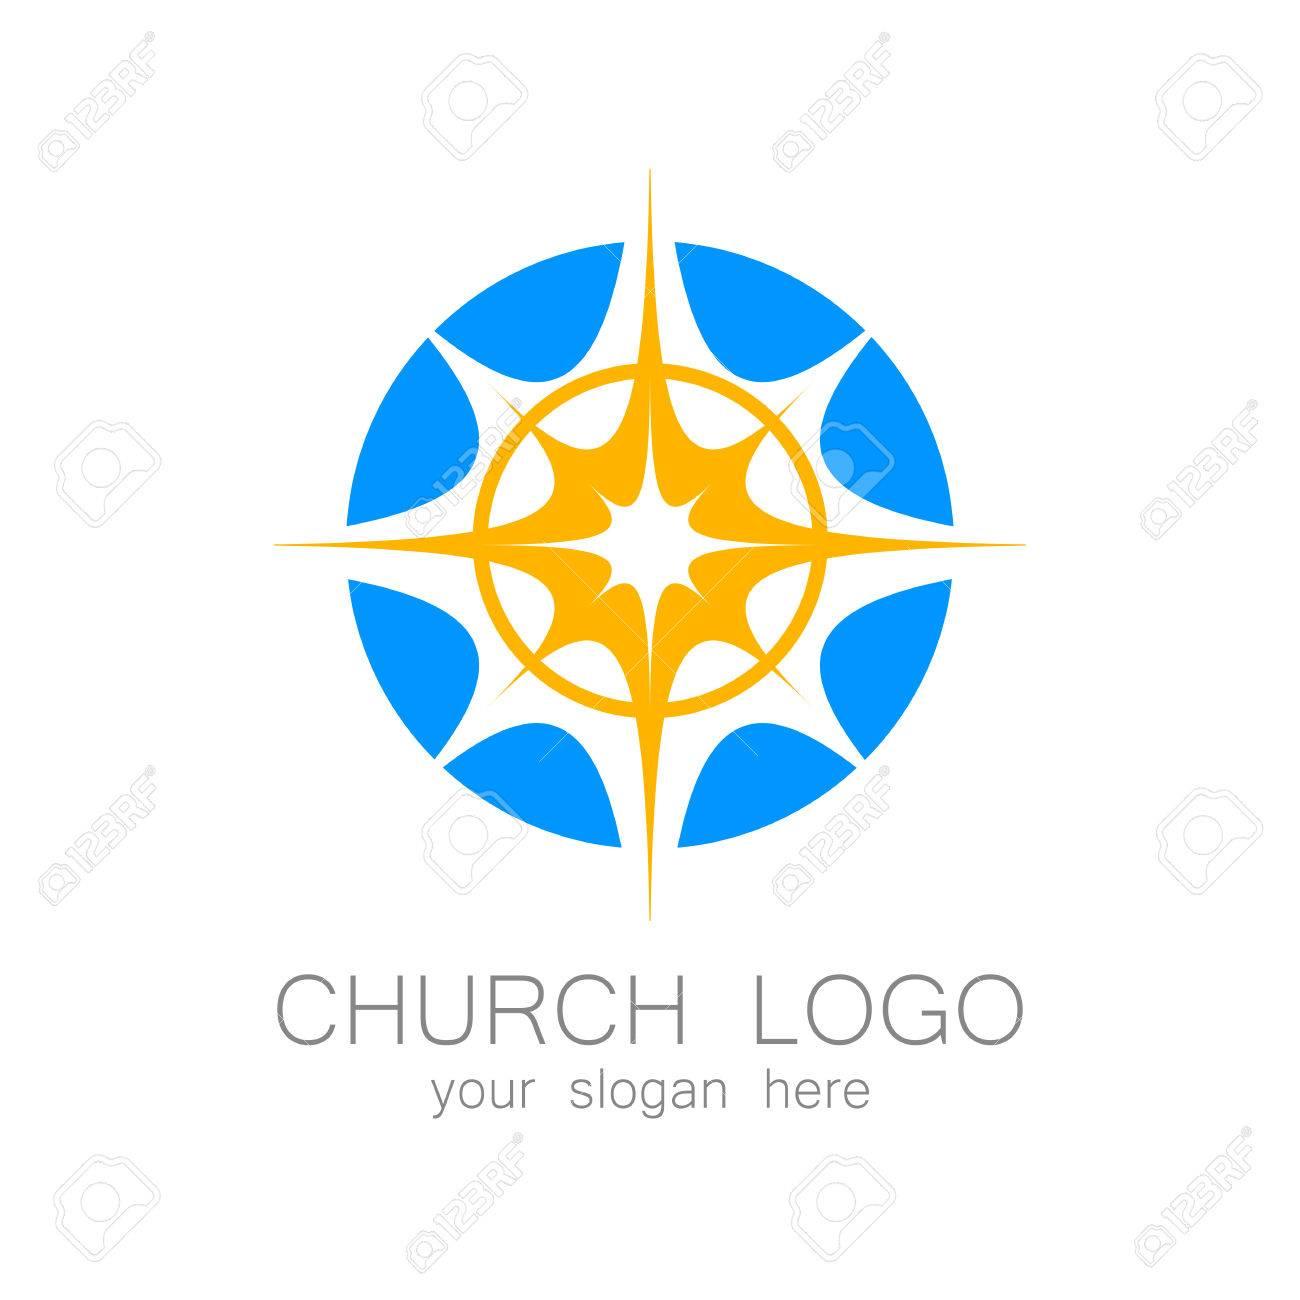 church logo design template template logo for churches and